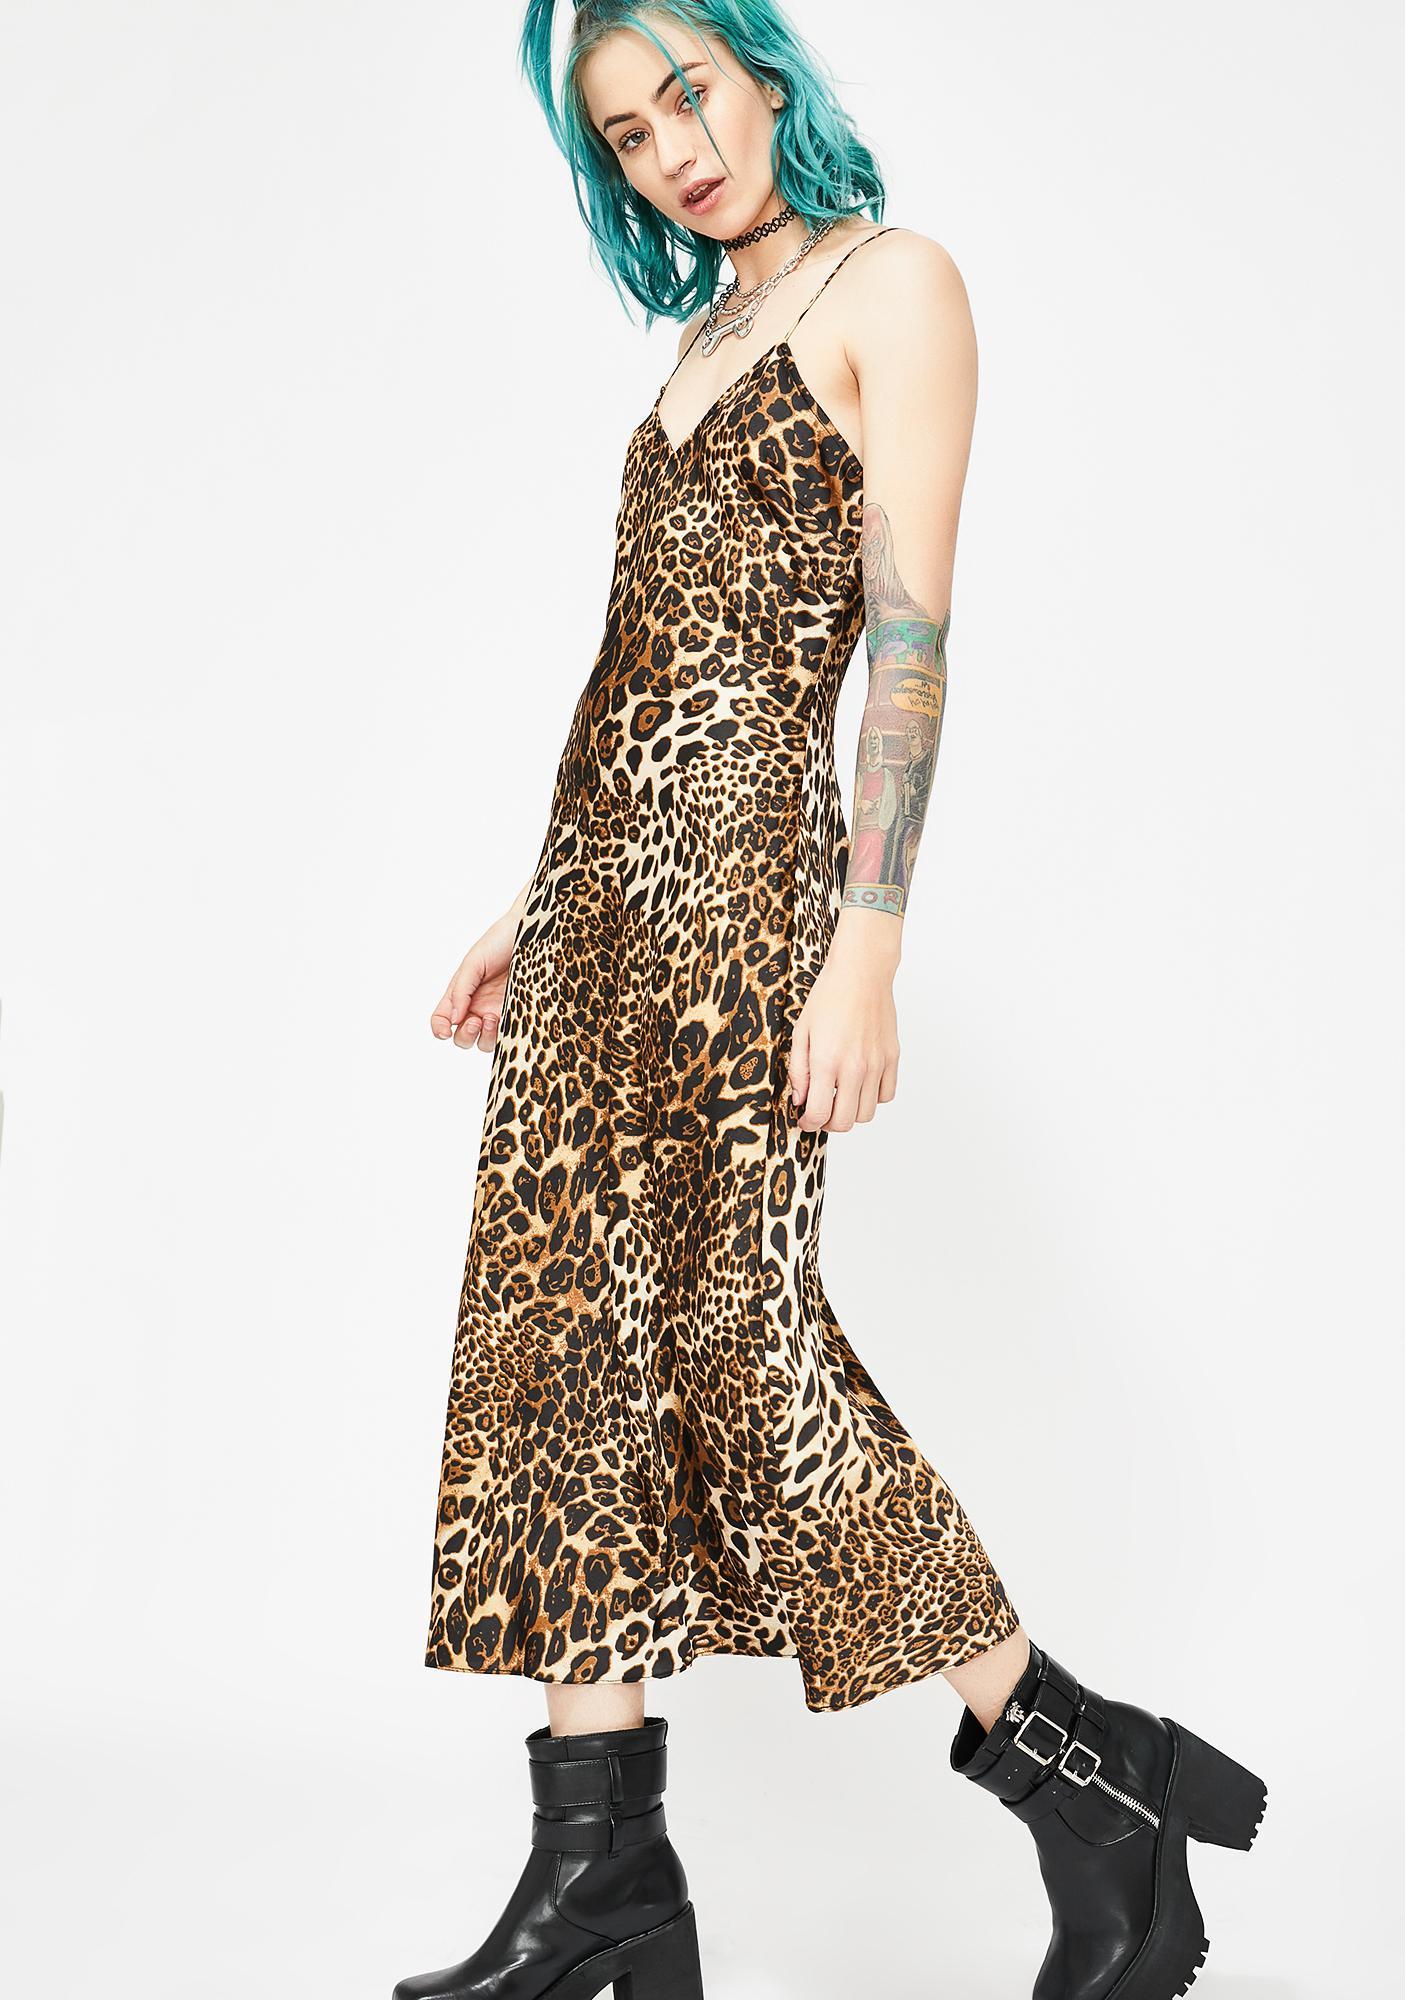 313166b417 Catatonic Territory Cheetah Dress